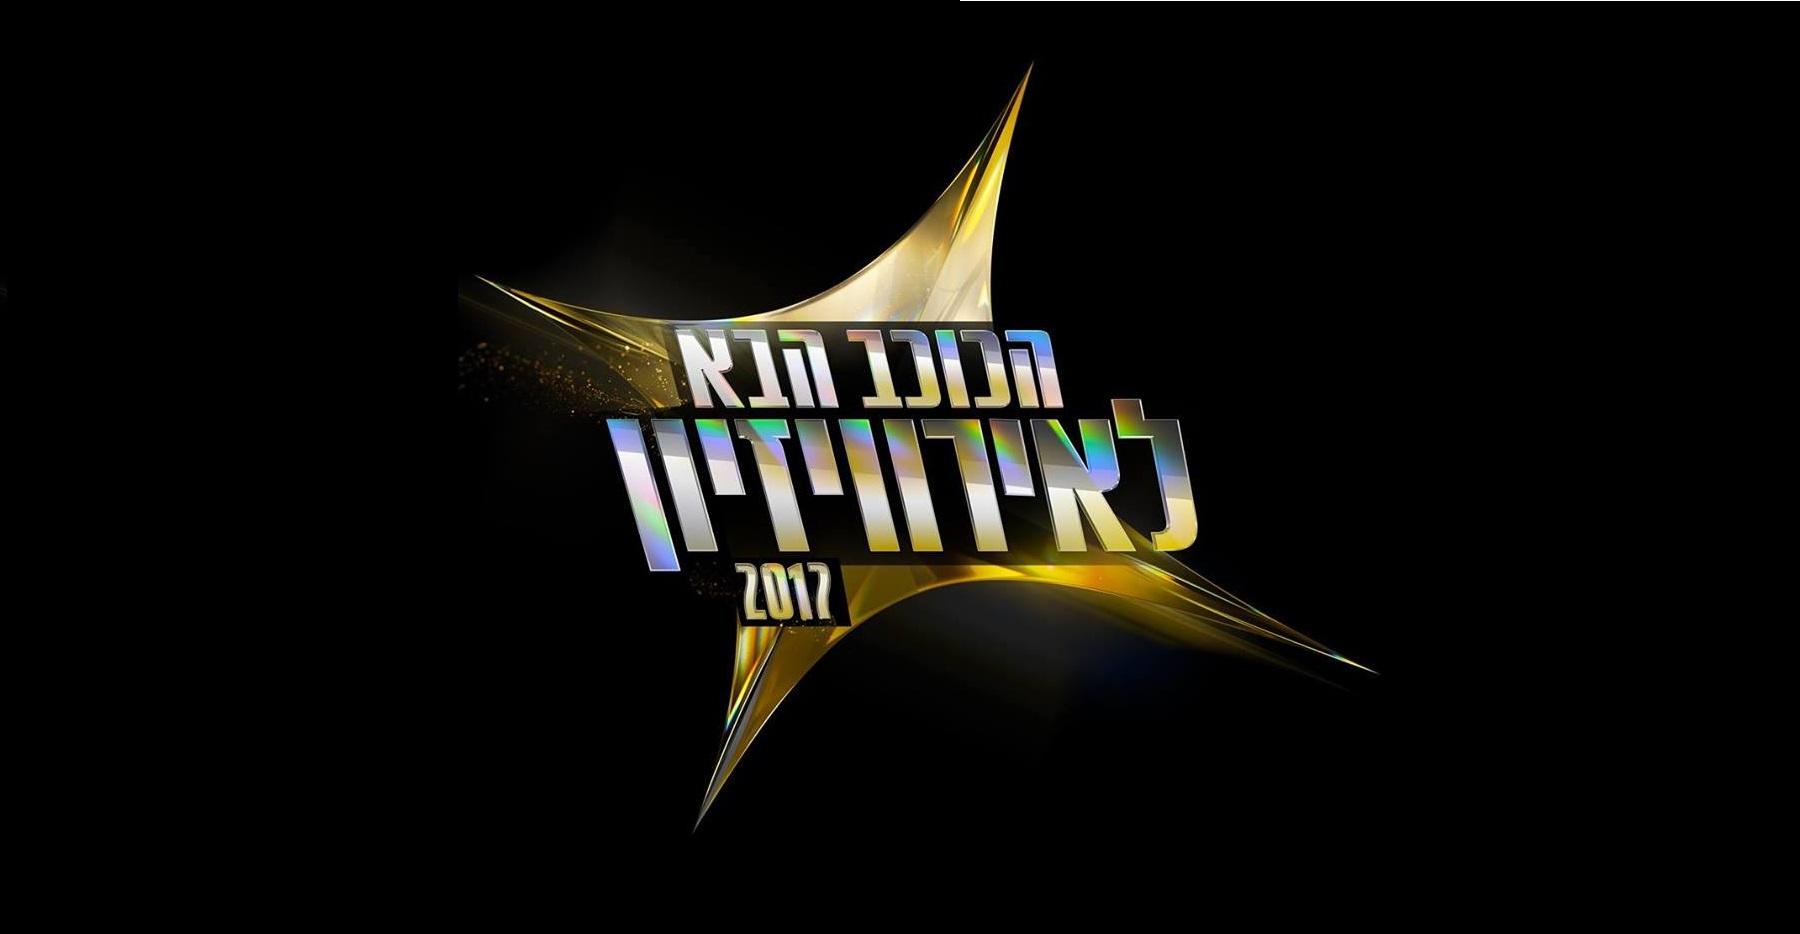 HaKoKhav HaBa 2017 : les 21 qualifiés